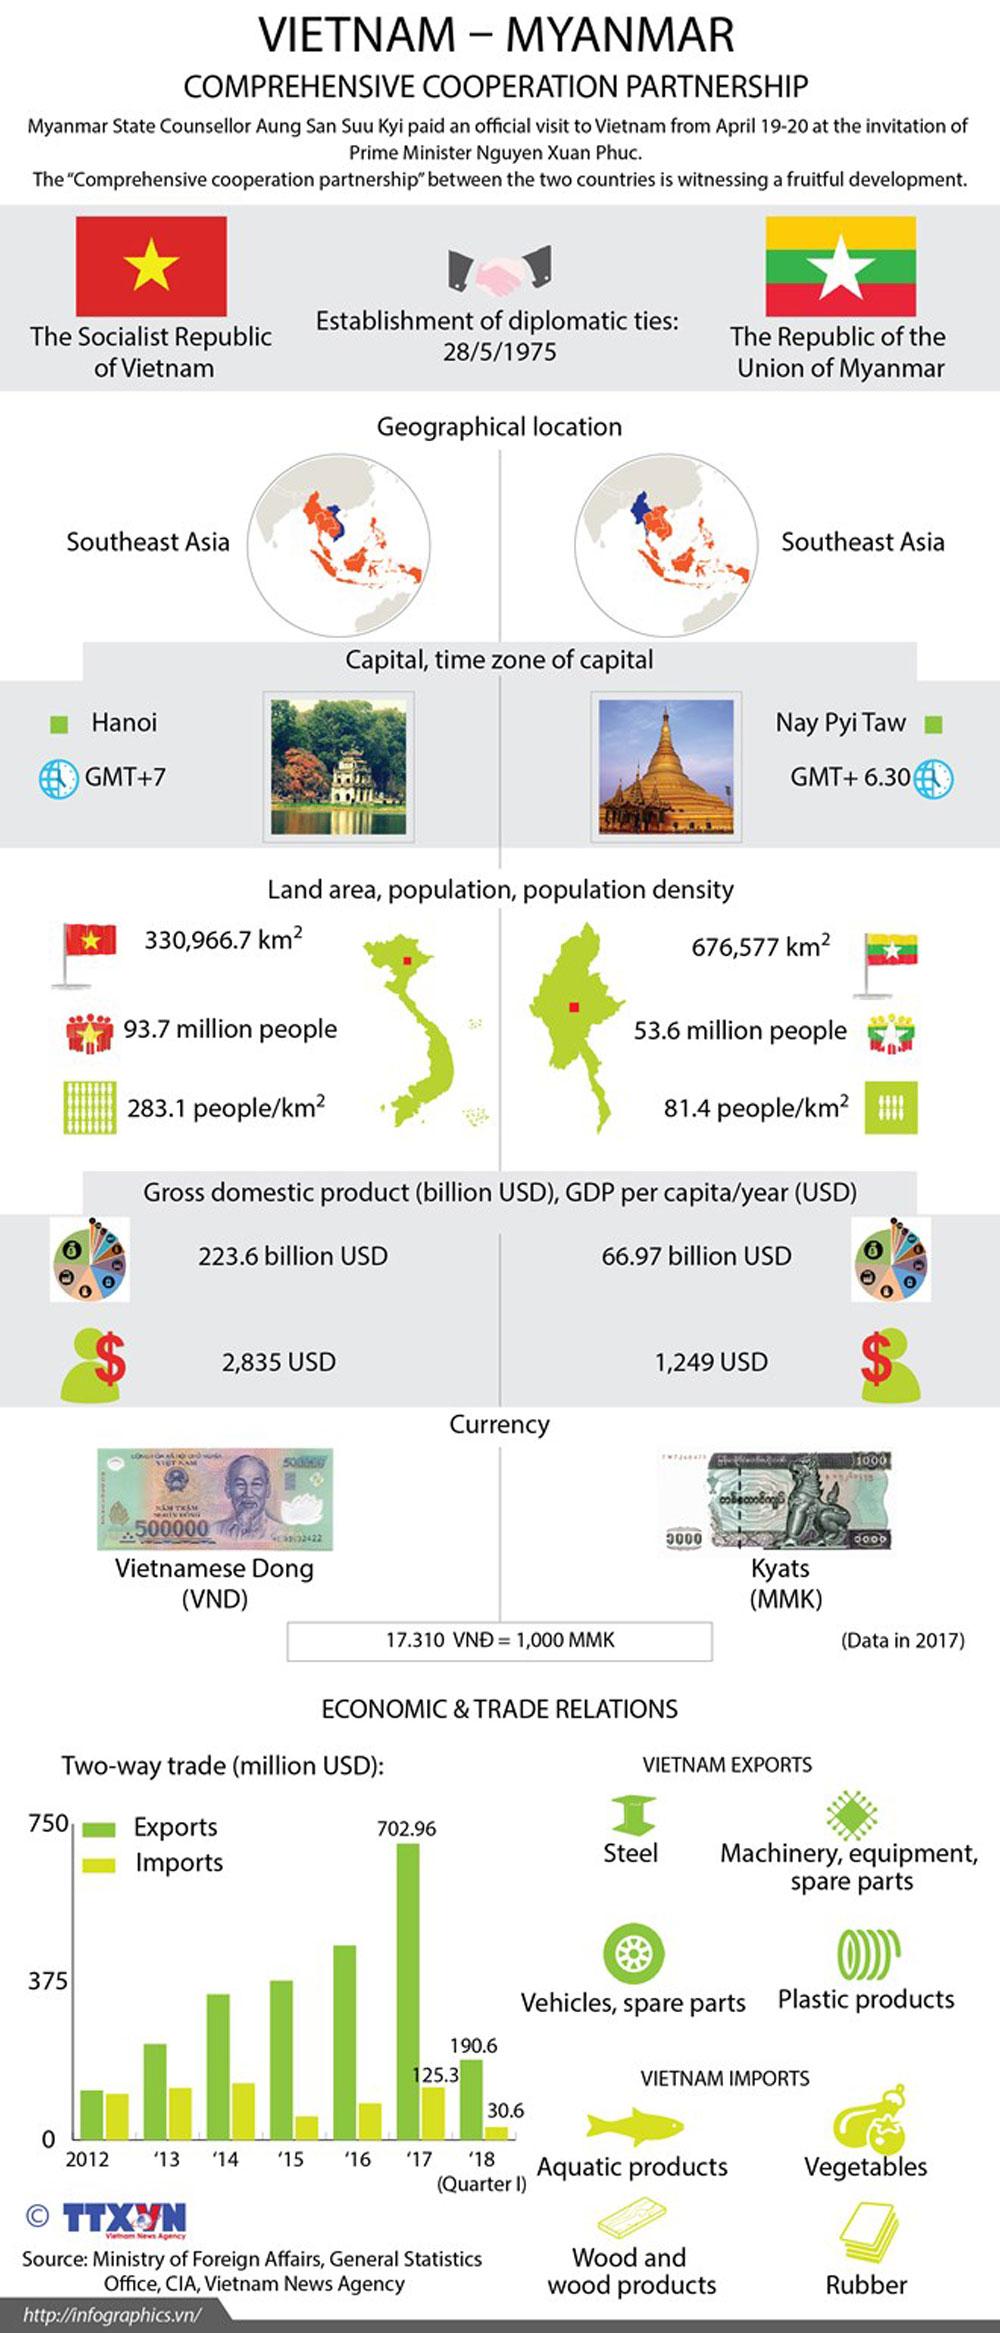 Vietnam-Myanmar, comprehensive cooperative partnership, fruitful development, Myanmar State Counsellor, Aung San Suu Kyi, Prime Minister, Nguyen Xuan Phuc